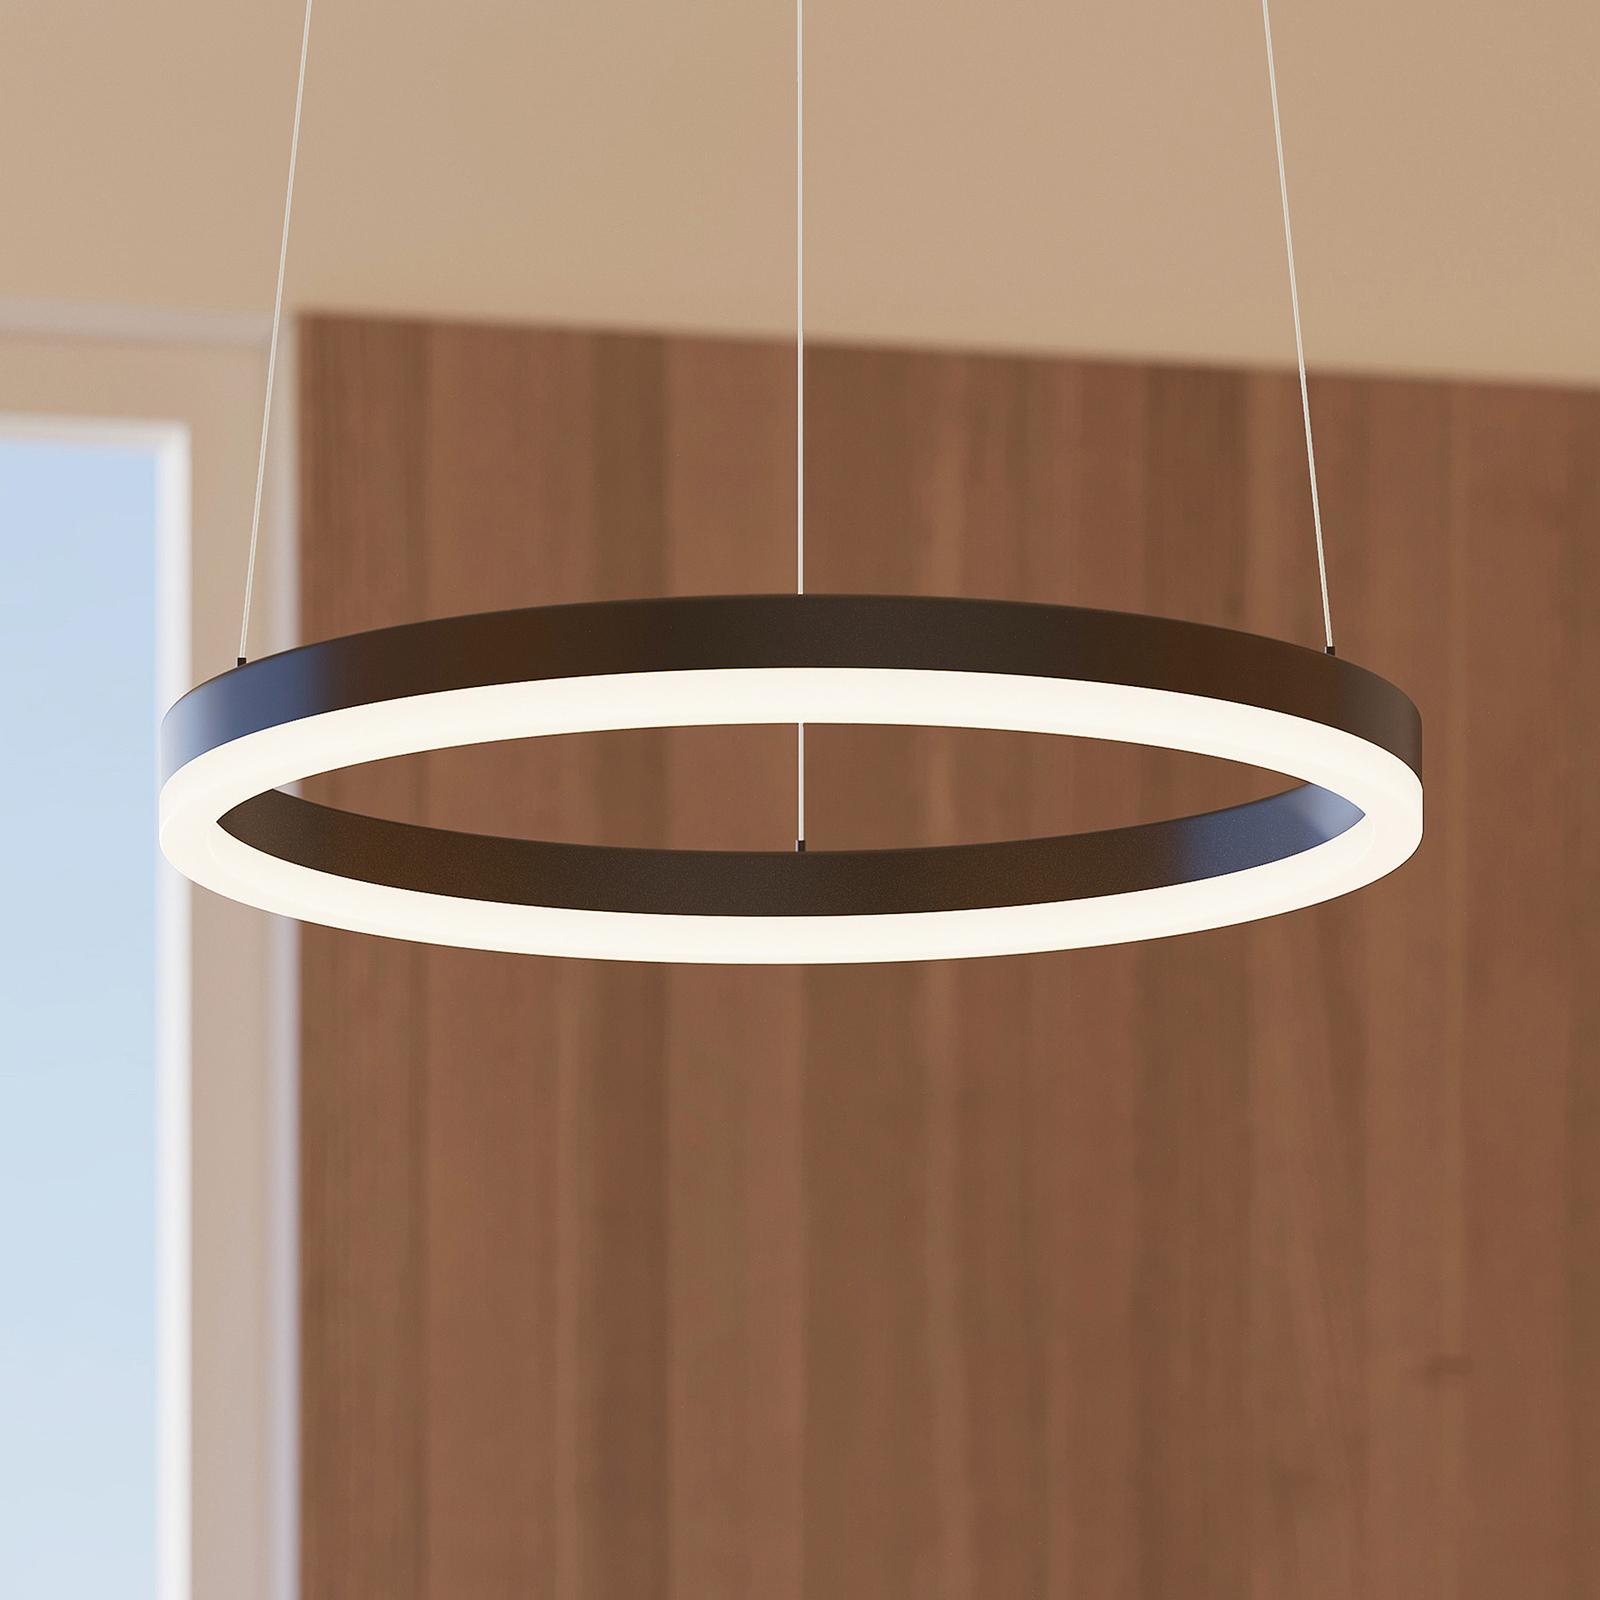 Arcchio Albiona LED-hængelampe, 1 ring, 40 cm